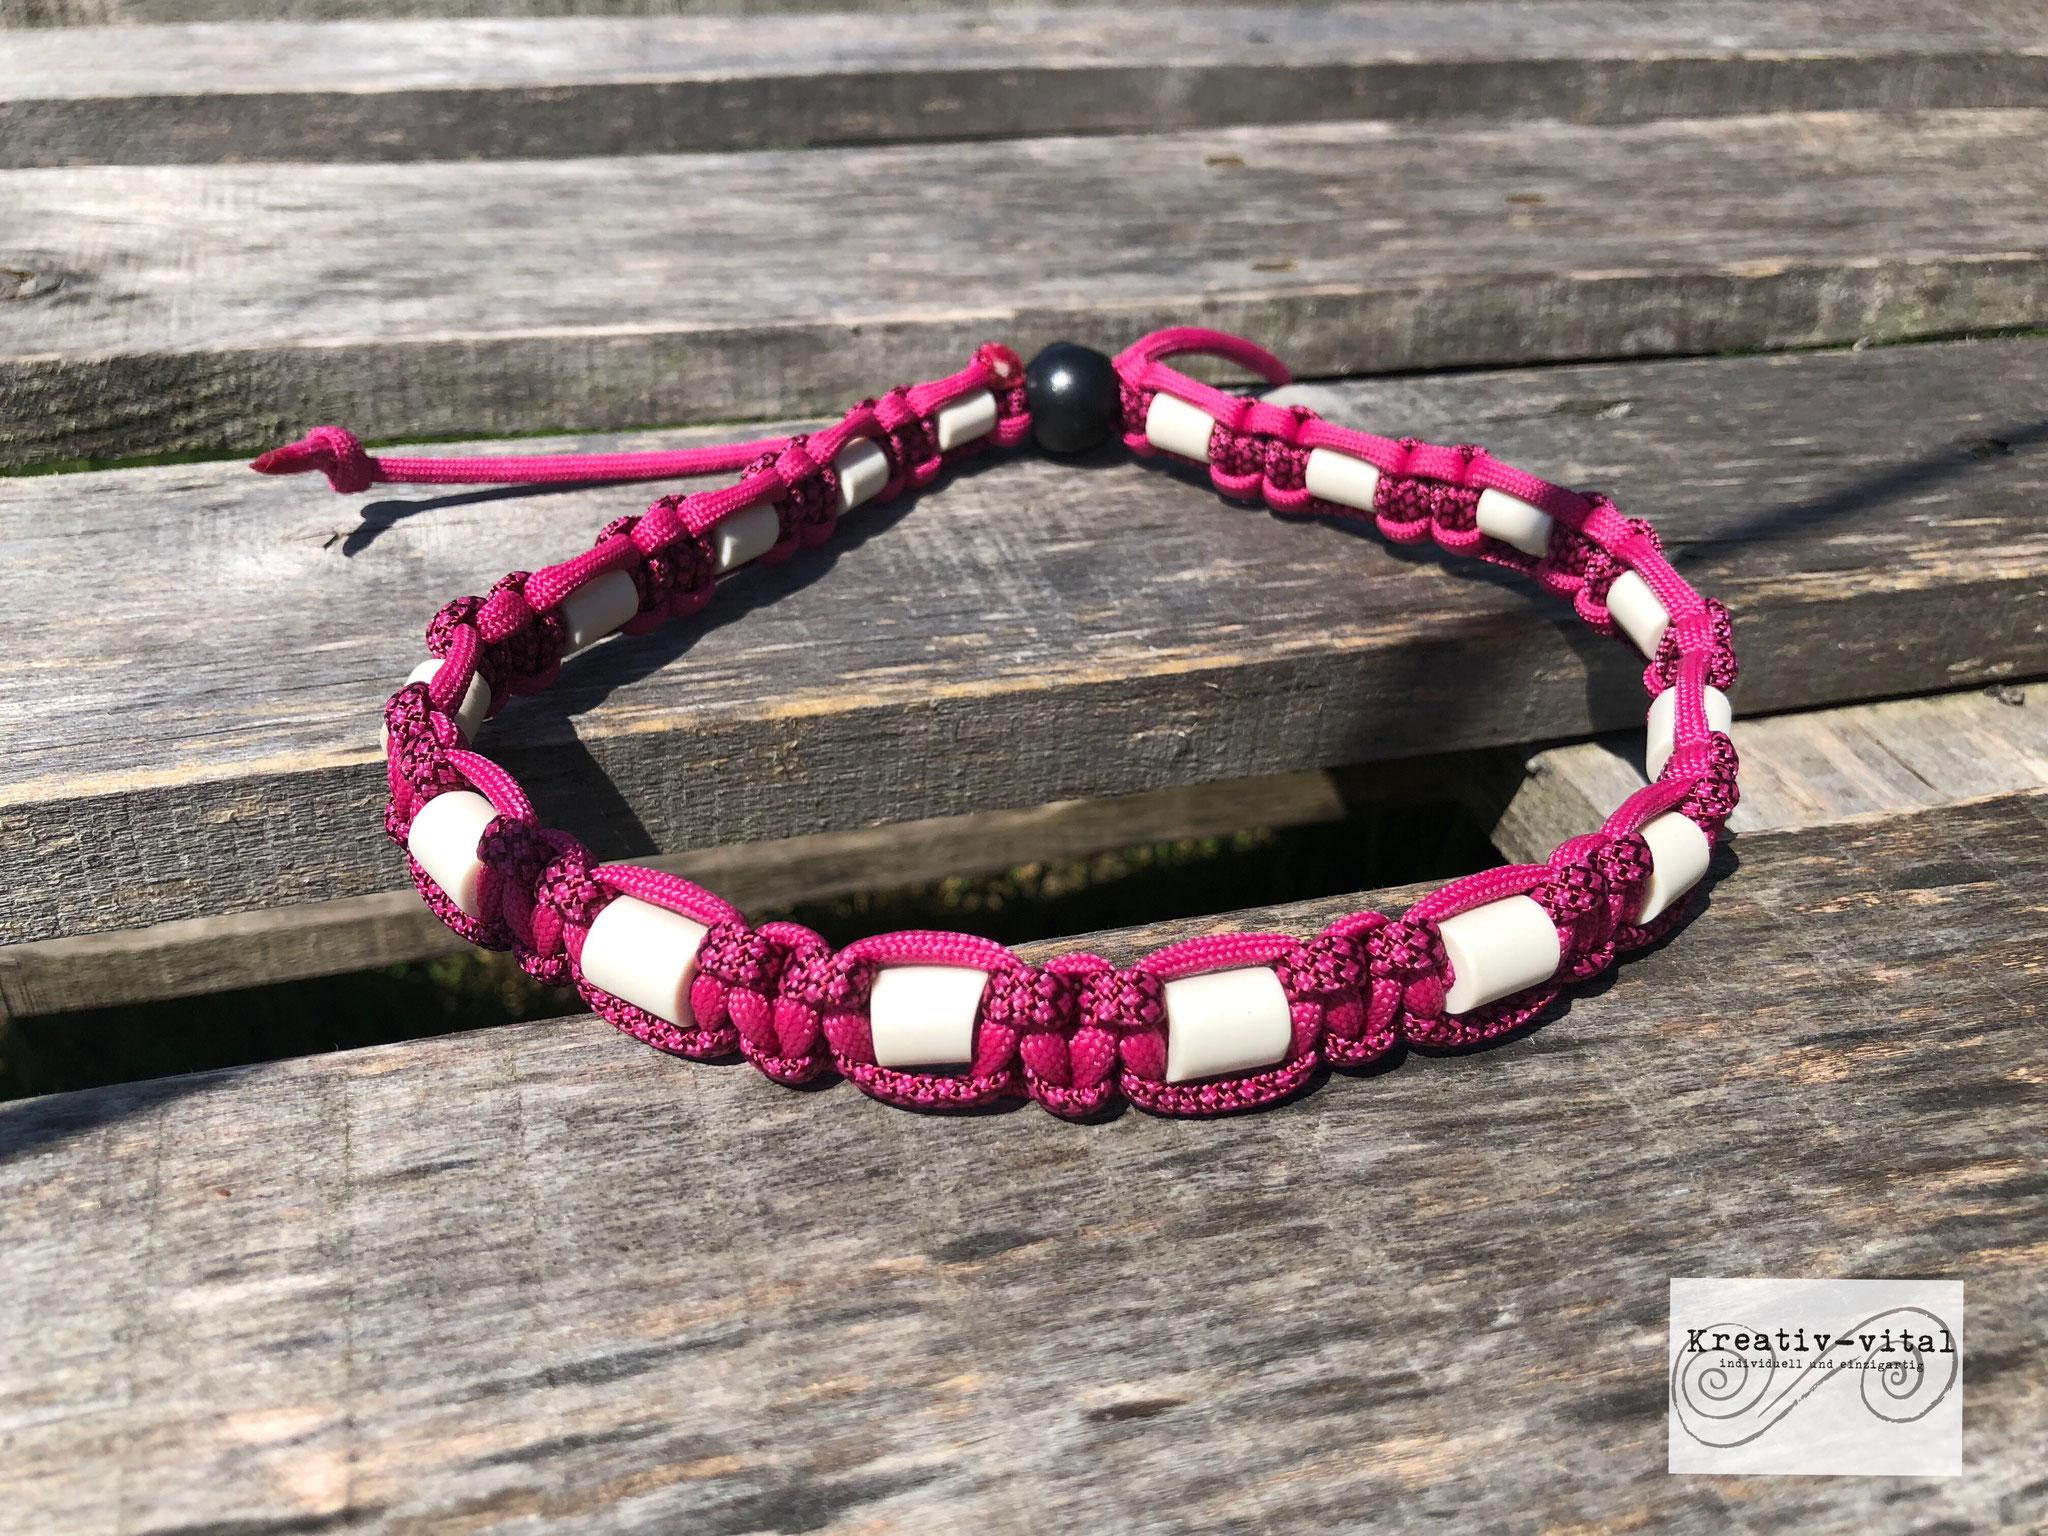 EM Keramik Halsband für Hund/Katze 46-50cm Halsumfang fuchsia/burgundy